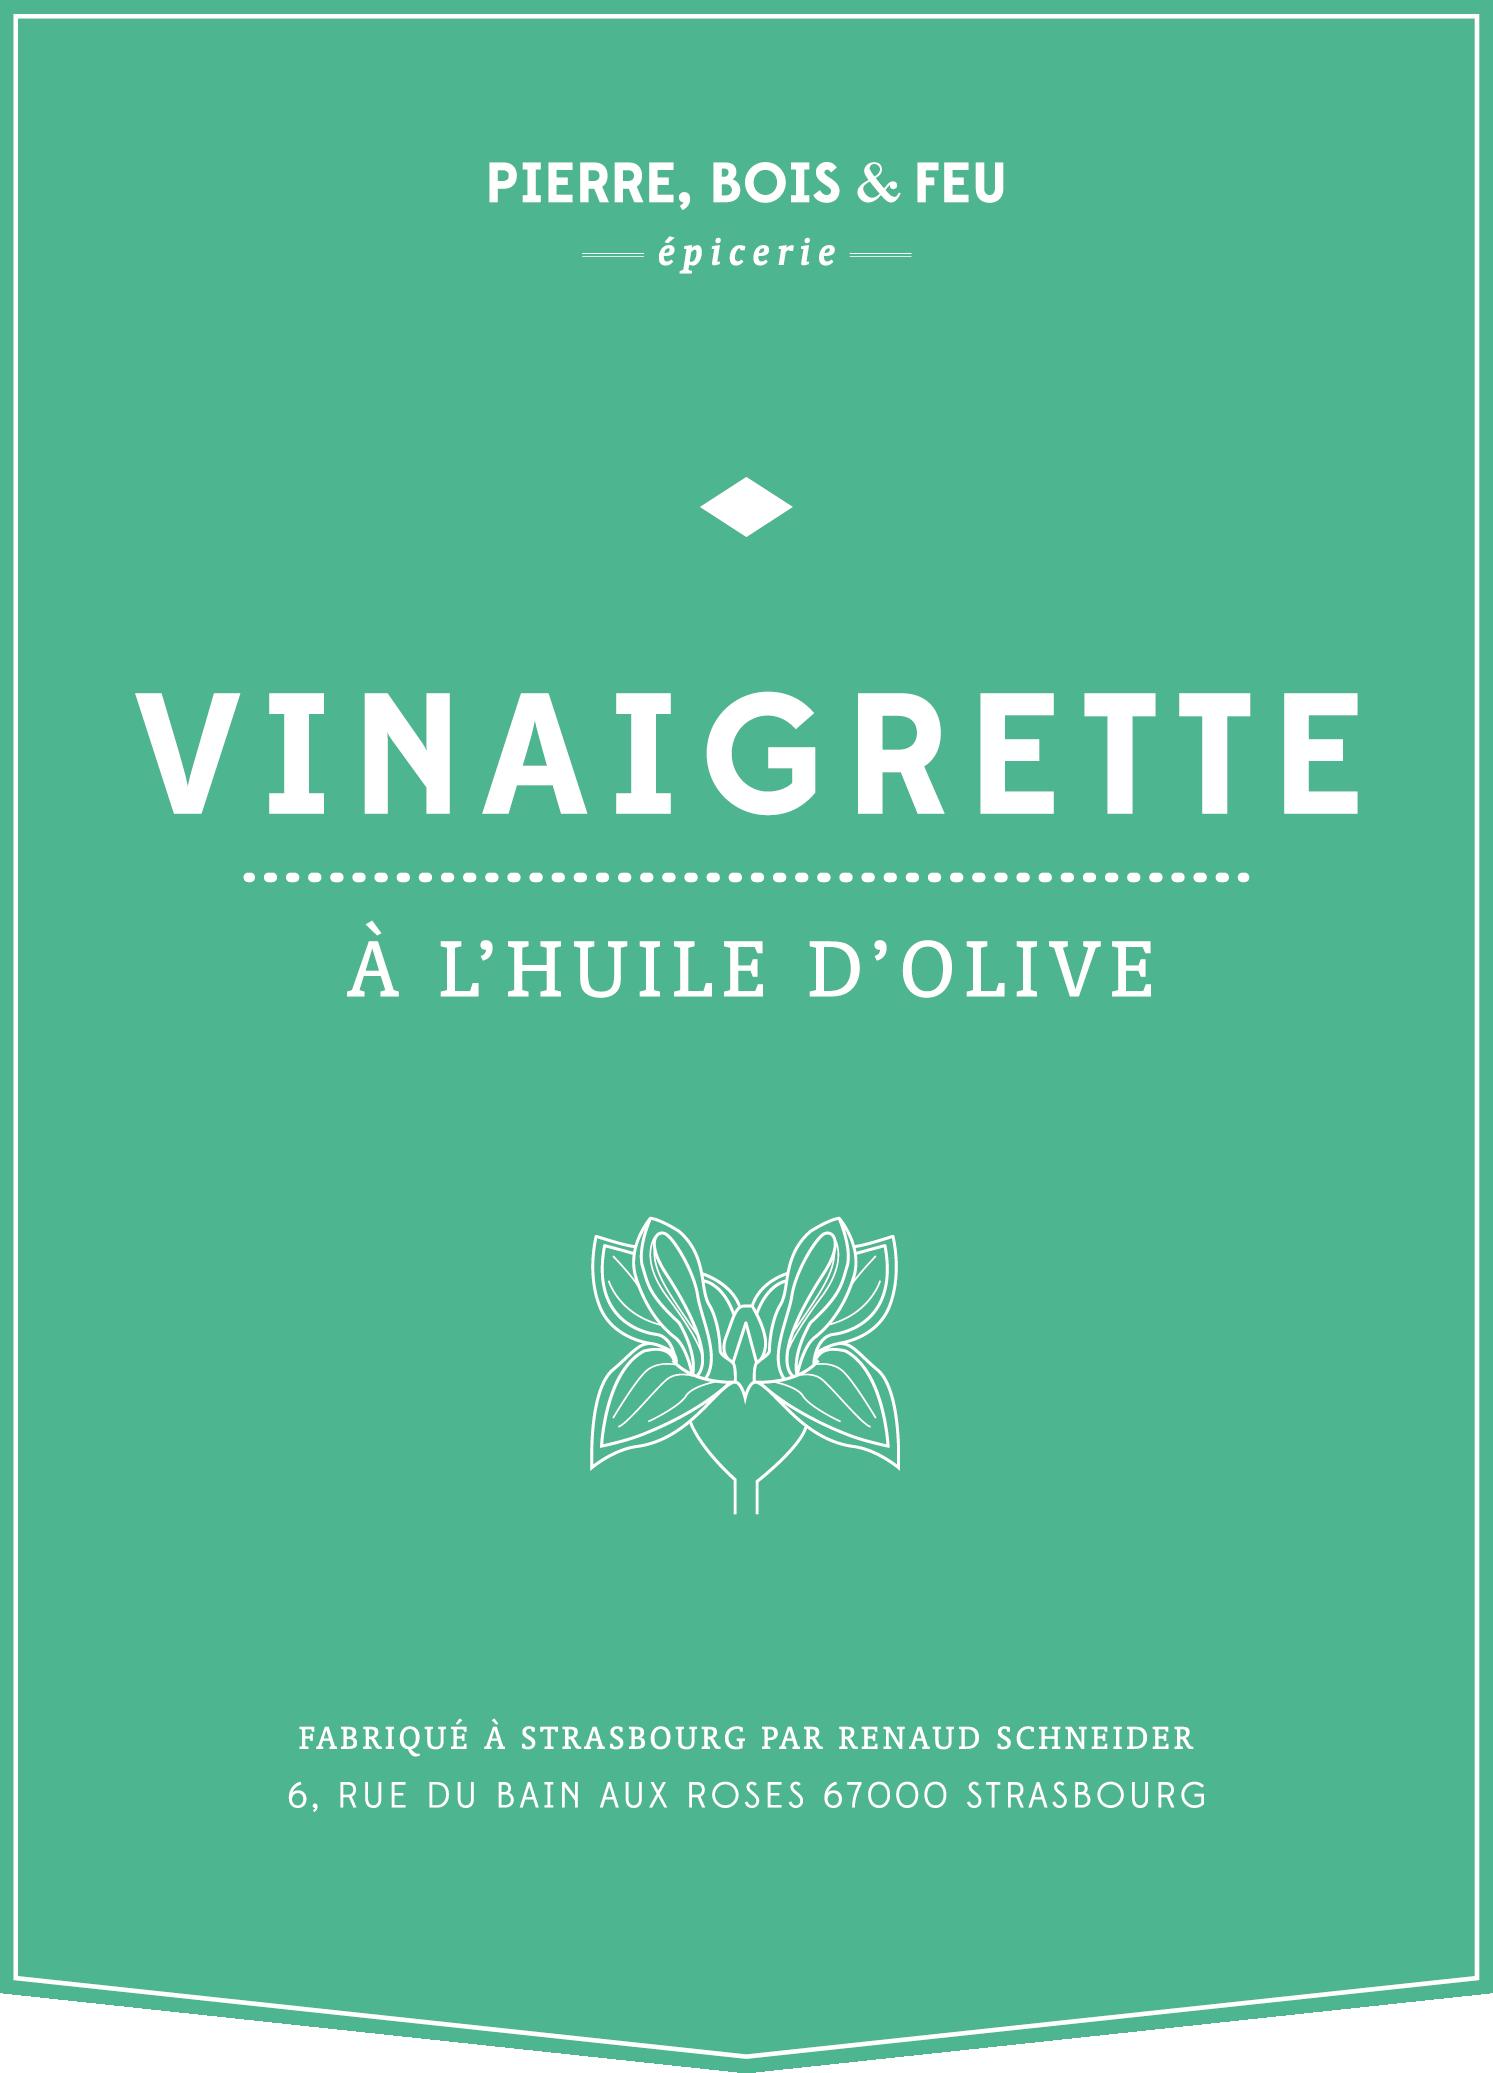 epicerie_vinaigrette-01